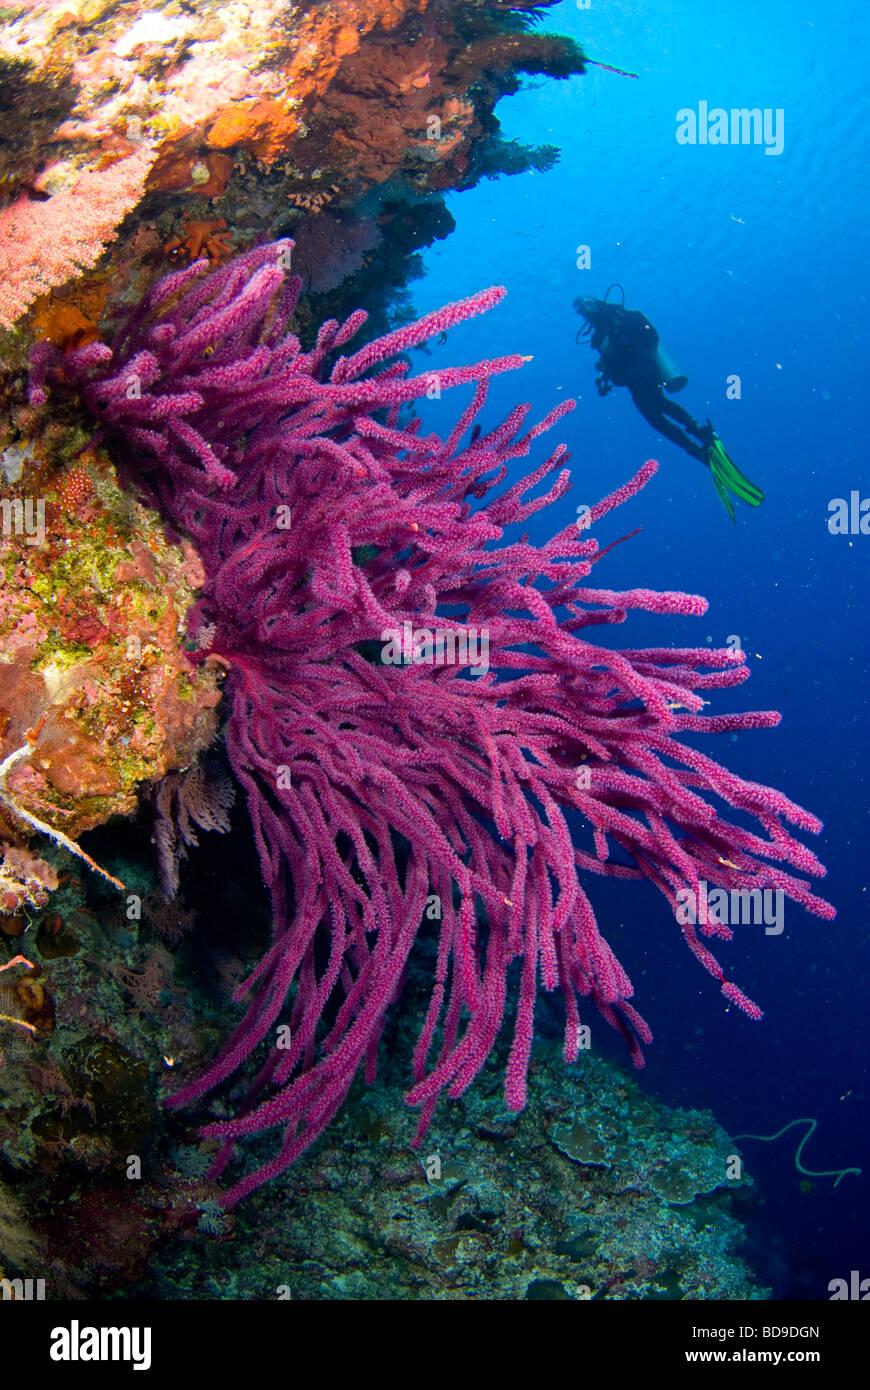 Scubadiver exploring philippine coral reef. - Stock Image